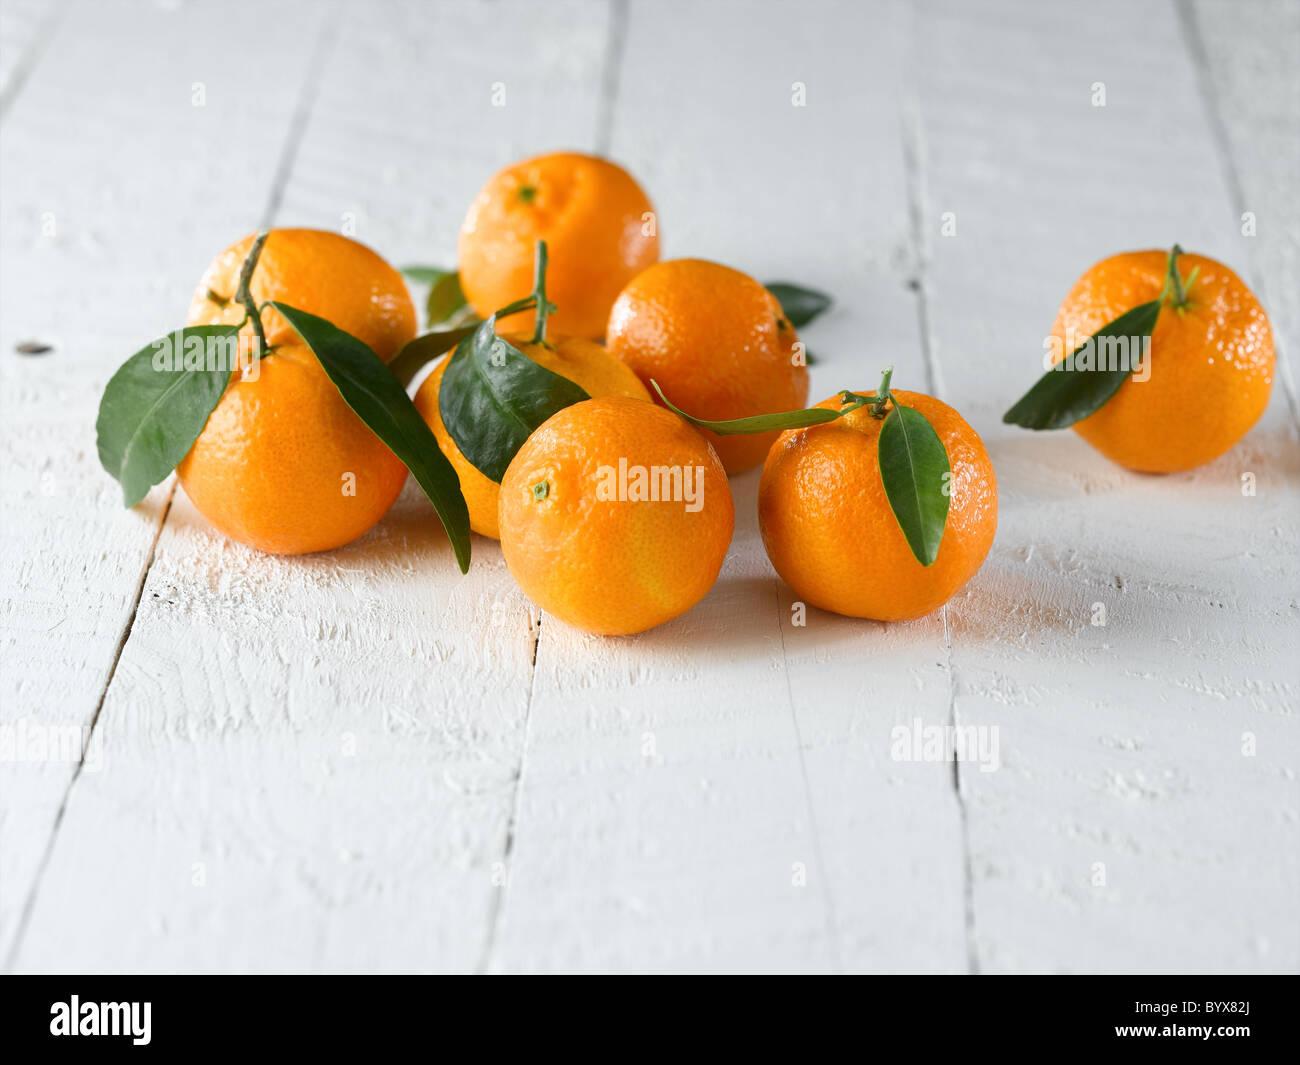 mandarins - Stock Image